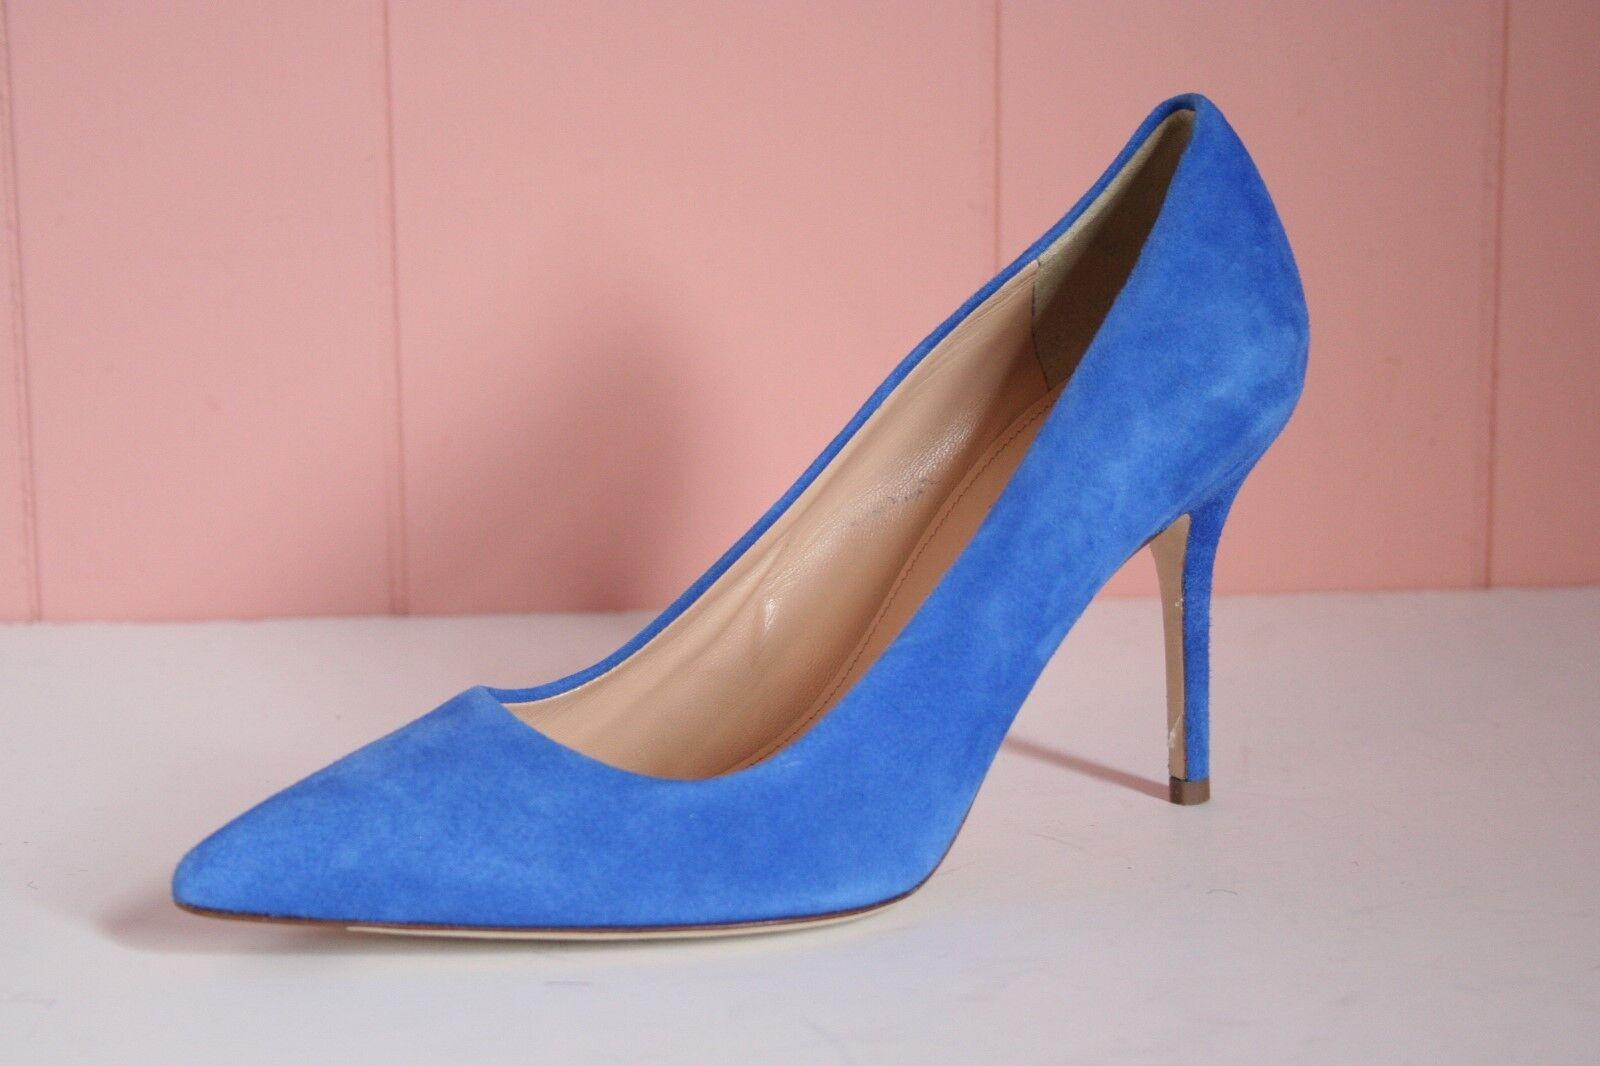 JCrew Elsie Suede Pumps 6.5 High-Heels Tidewater Blue E4969 $245